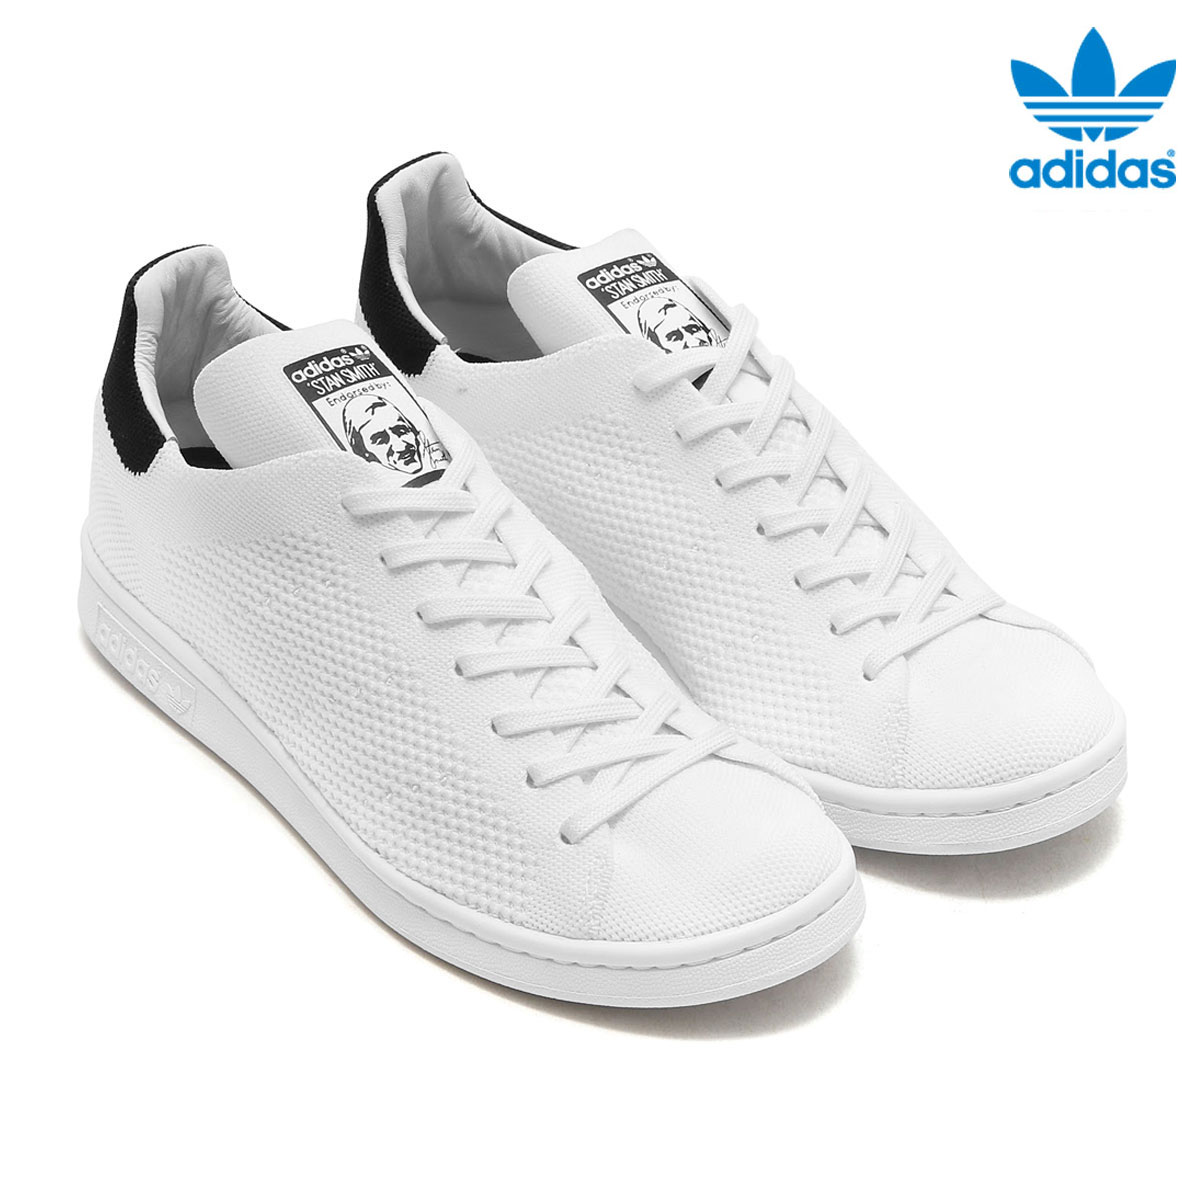 taille 40 51f0c c693b adidas Originals STAN SMITH PK (Adidas originals Stan Smith PK) (Running  White/Running White/Core Black) 17FW-I